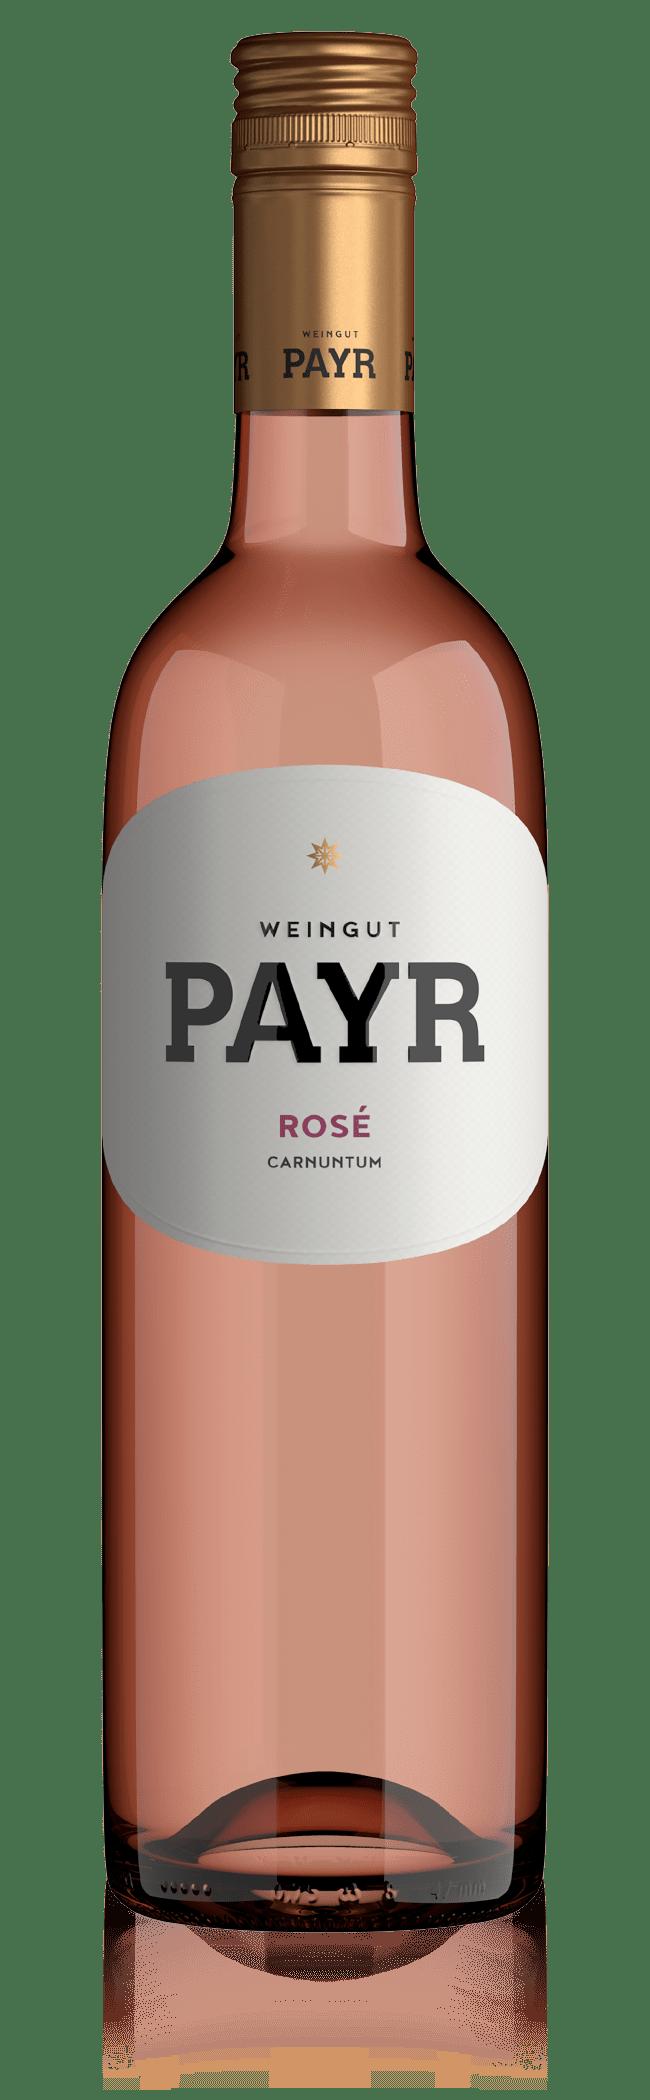 Weingut Payr Rose